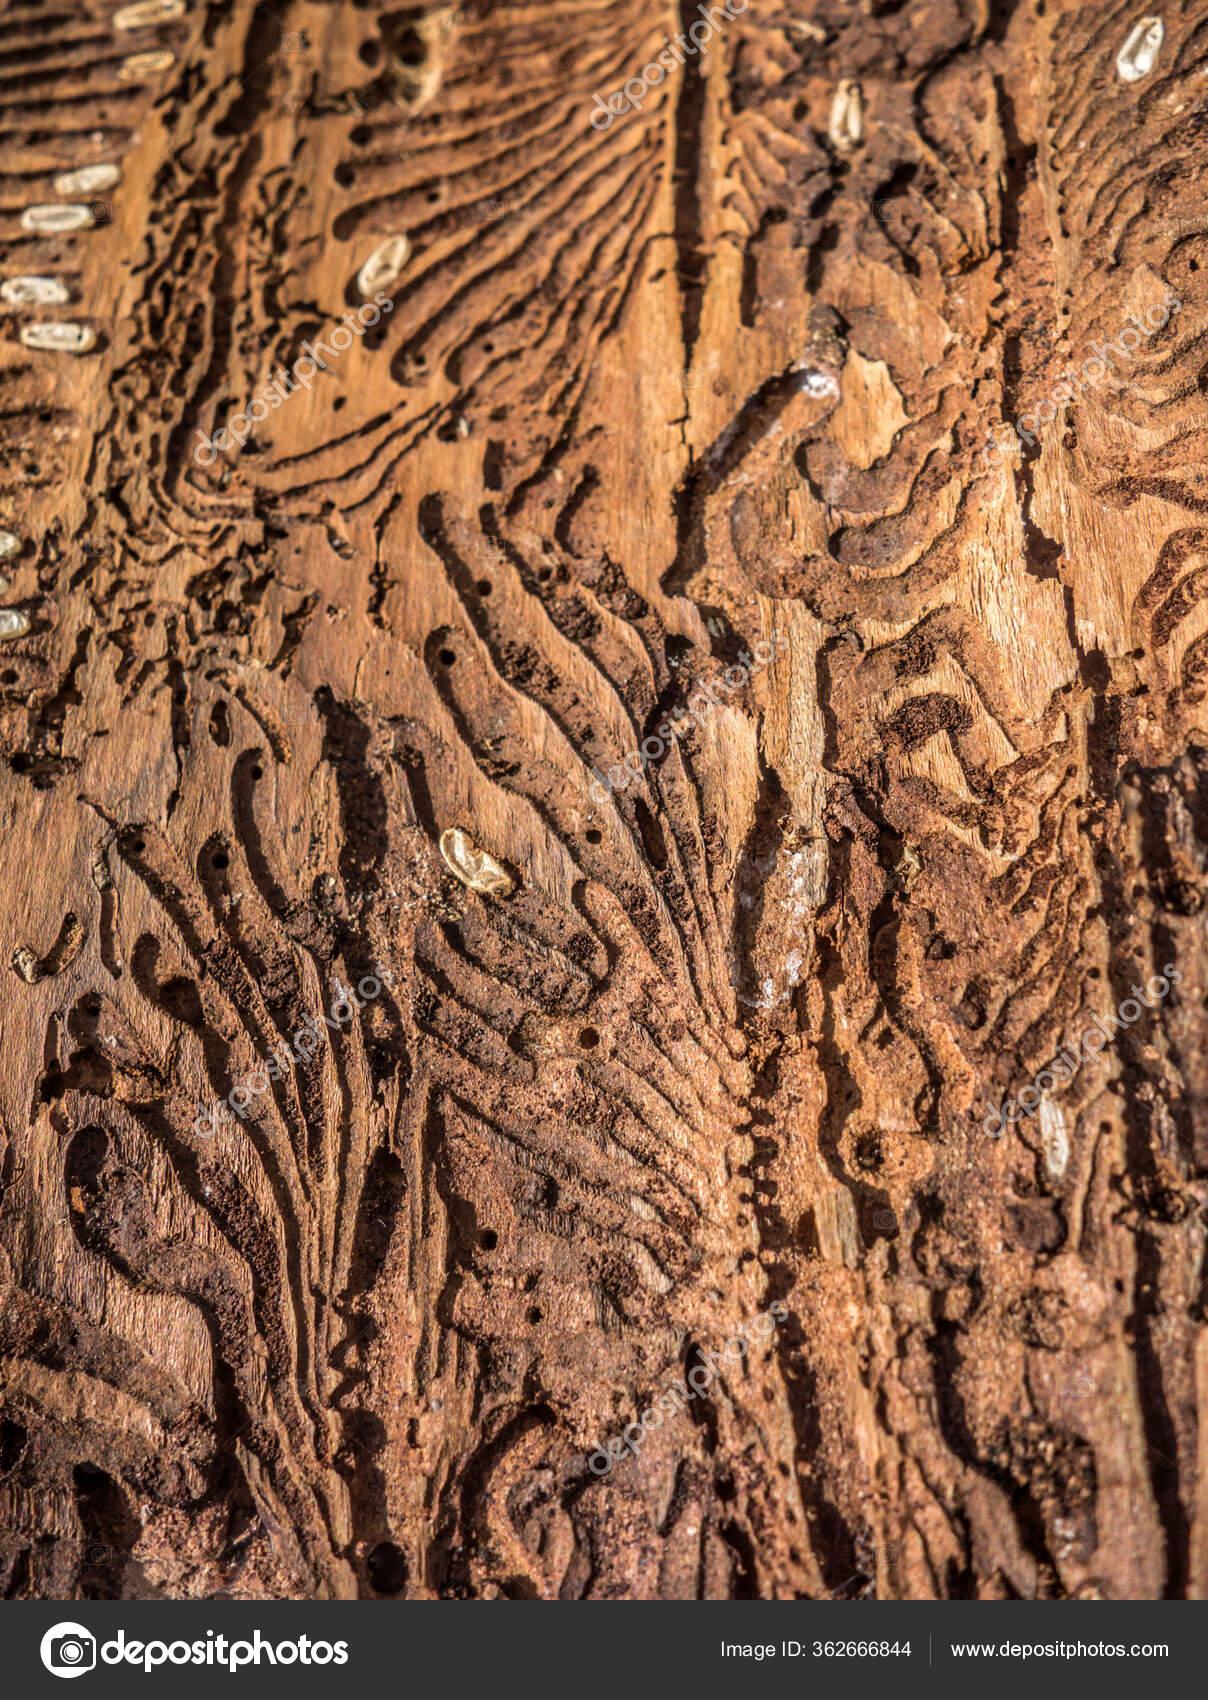 Traces of a pest on a tree bark closeup